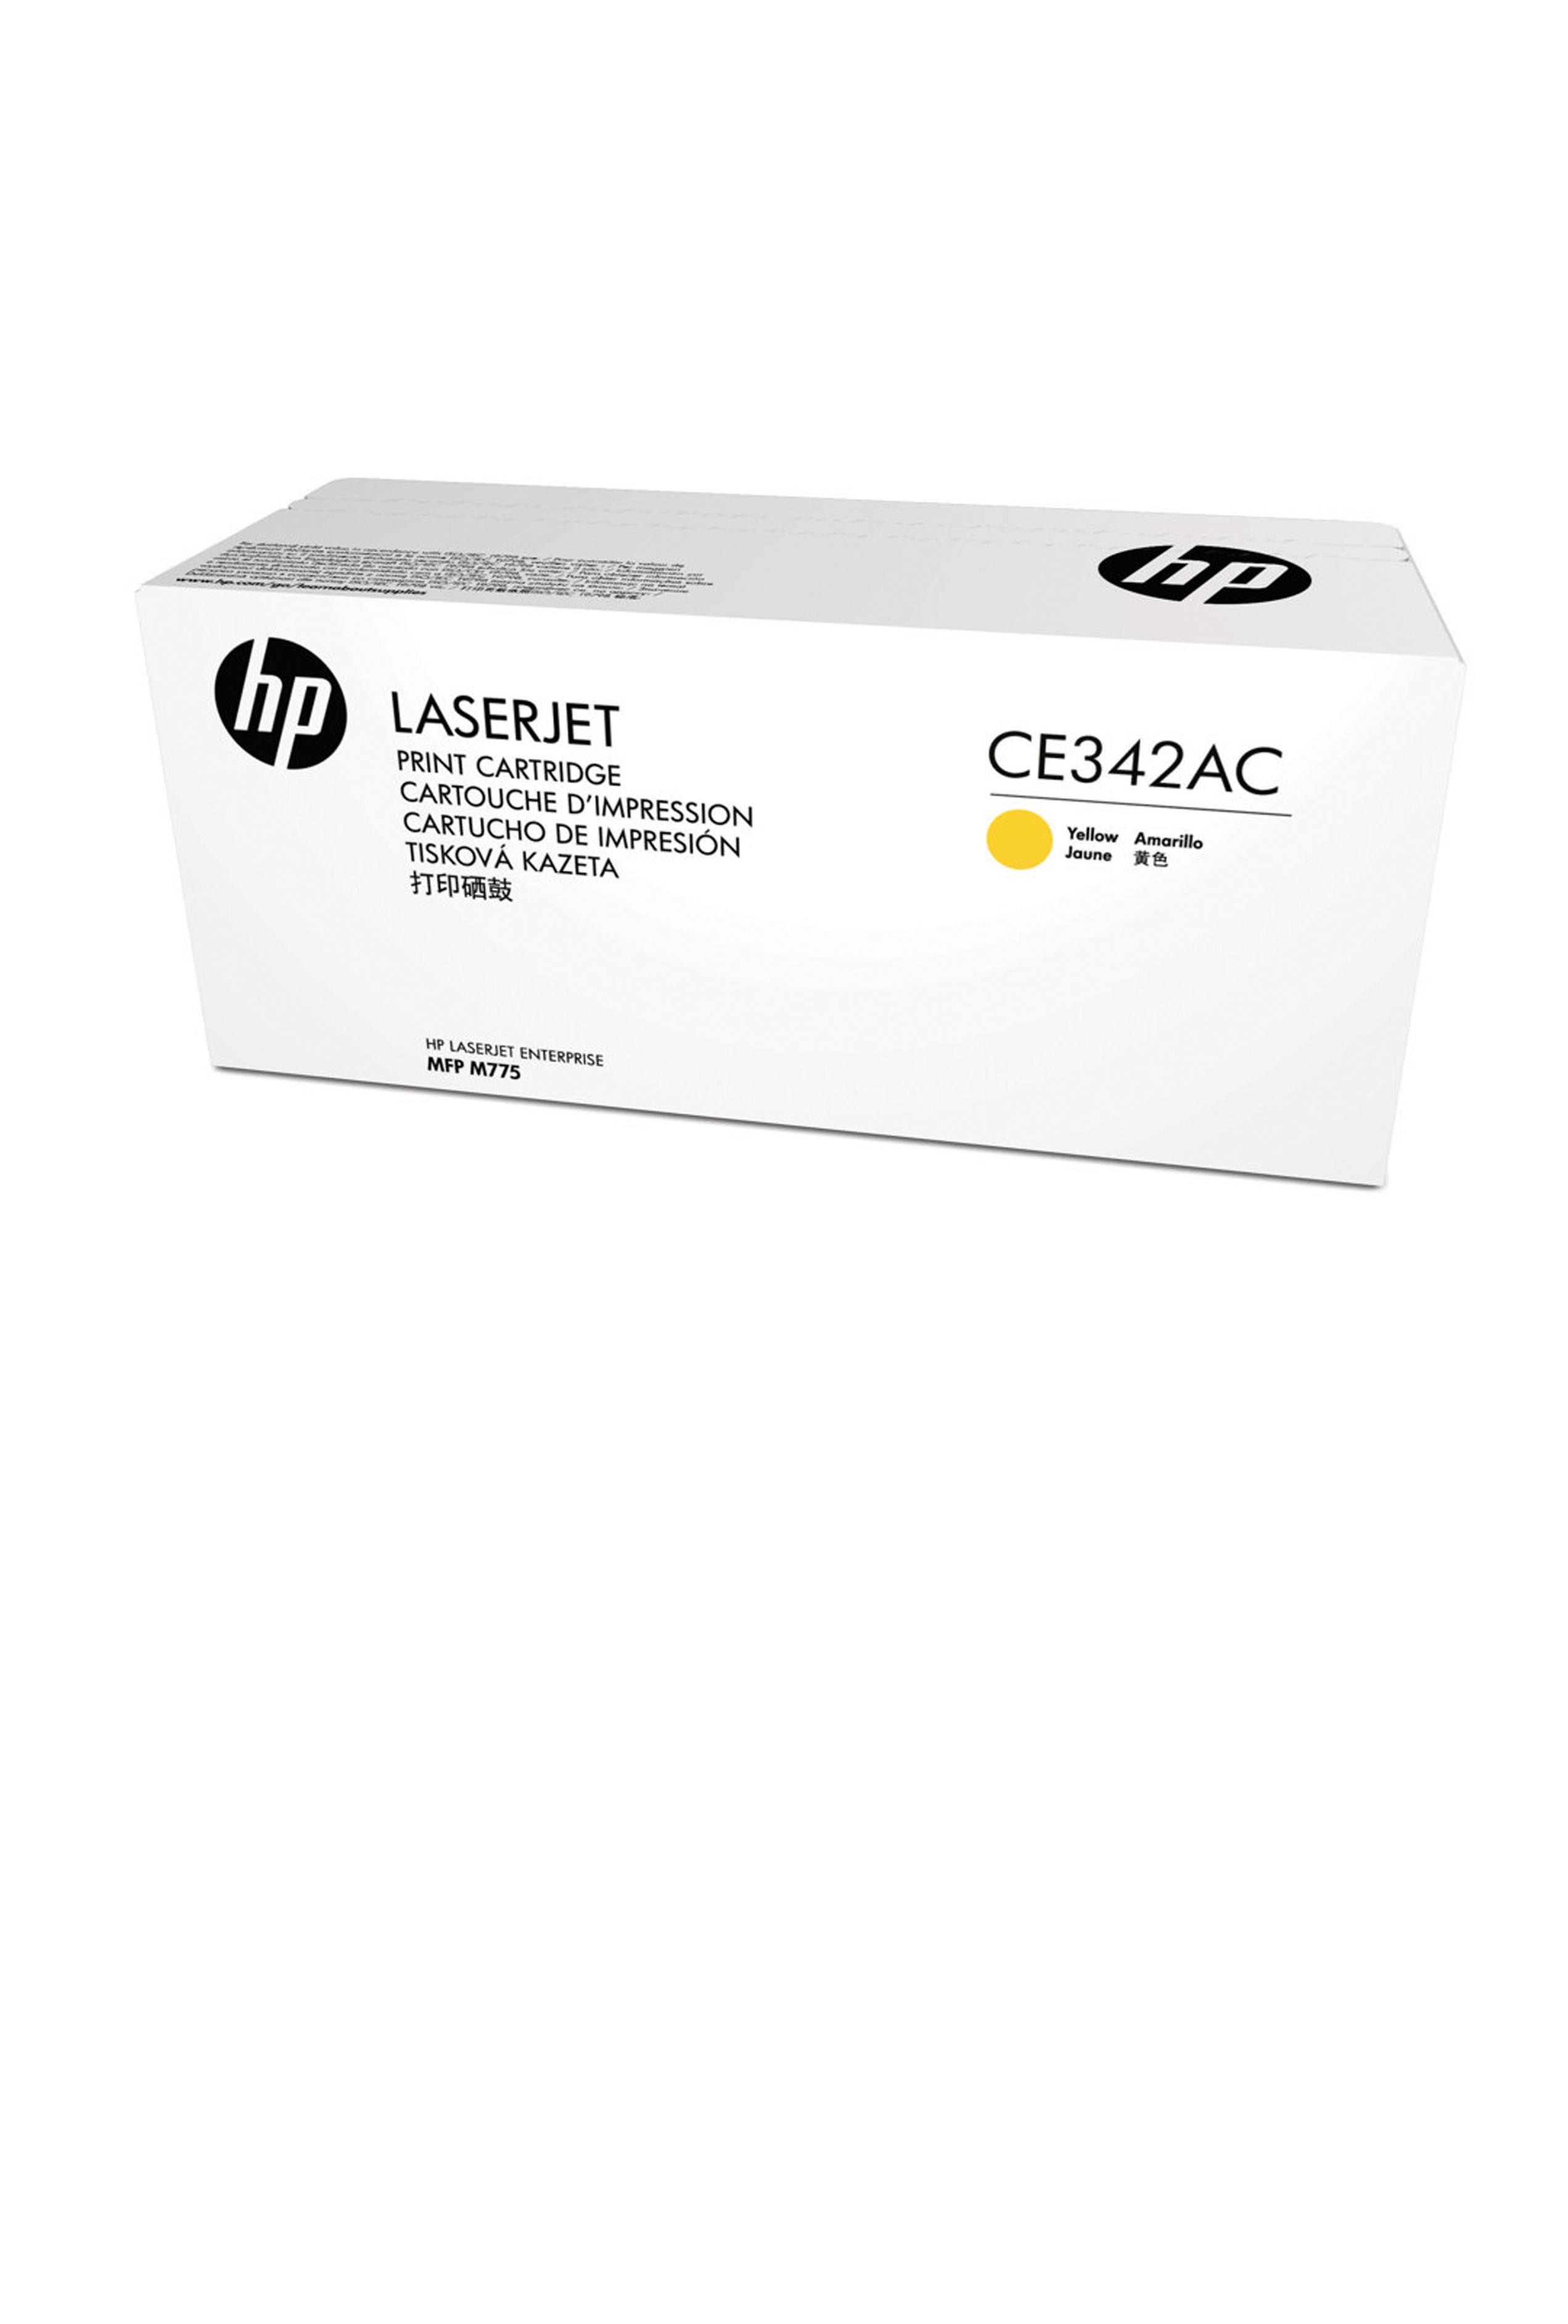 HP Laserjet Yellow Print Cartrdige (CE342AC)